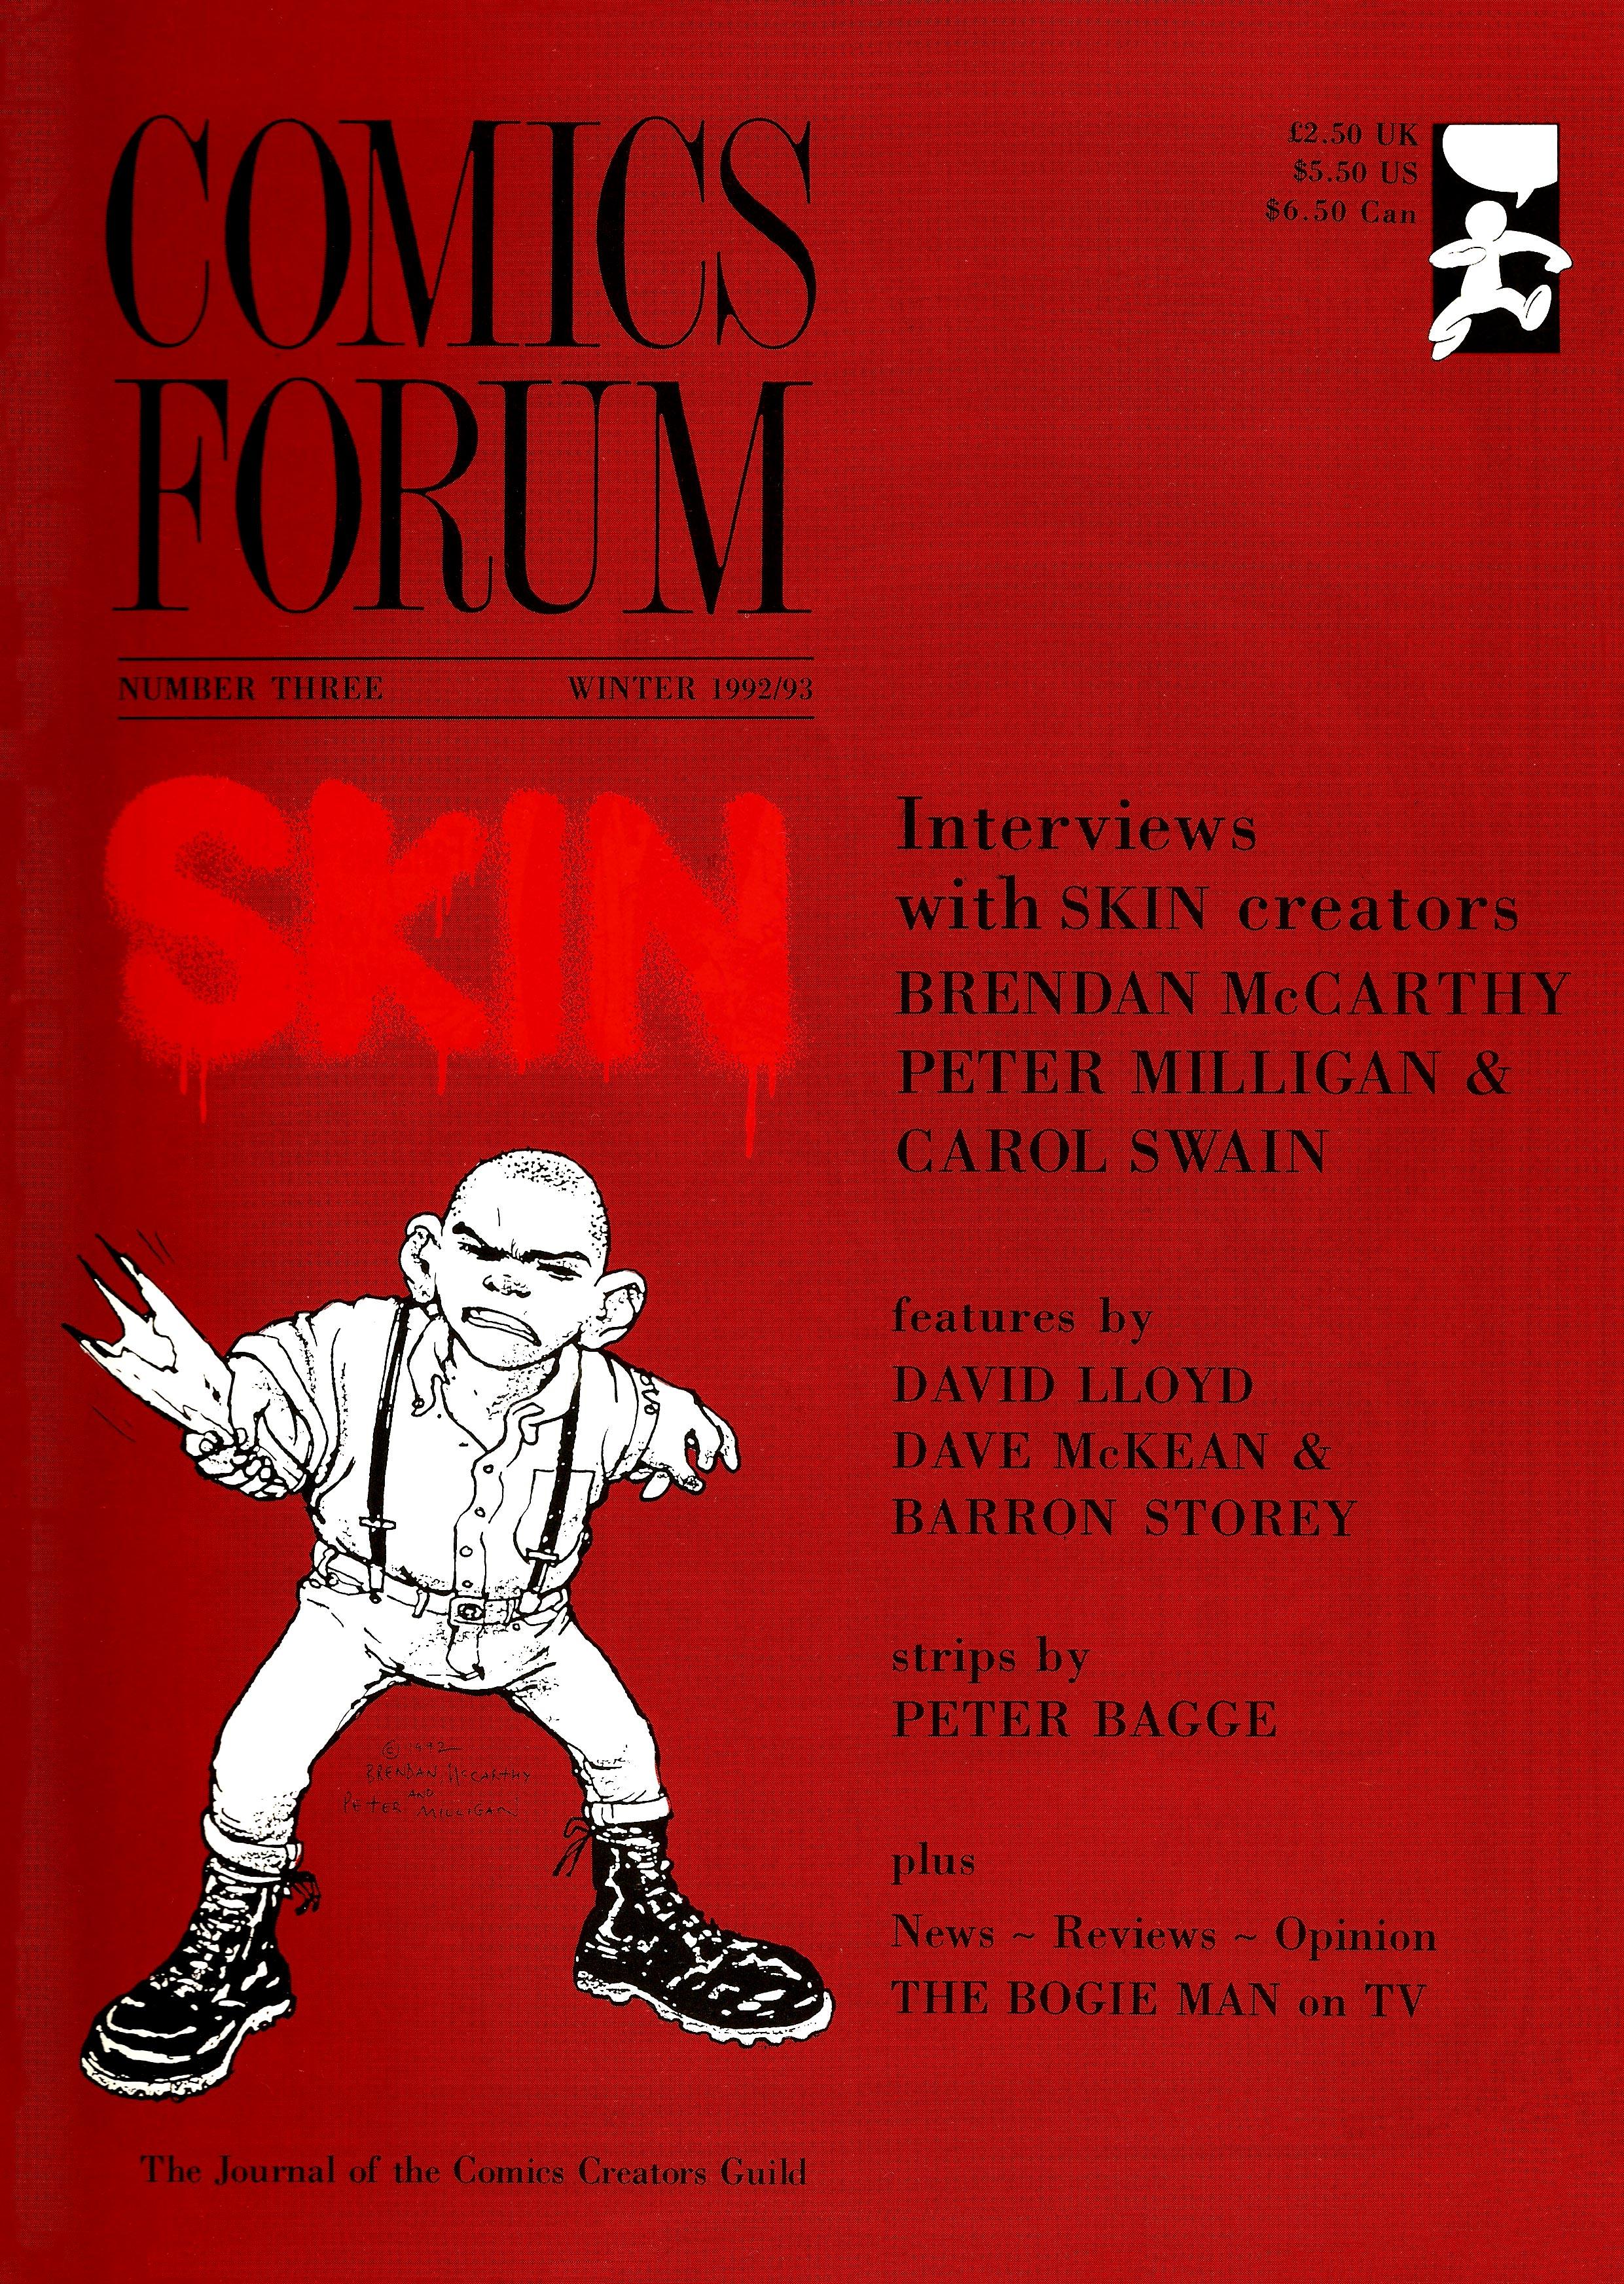 Comics Forum 3 - Cover